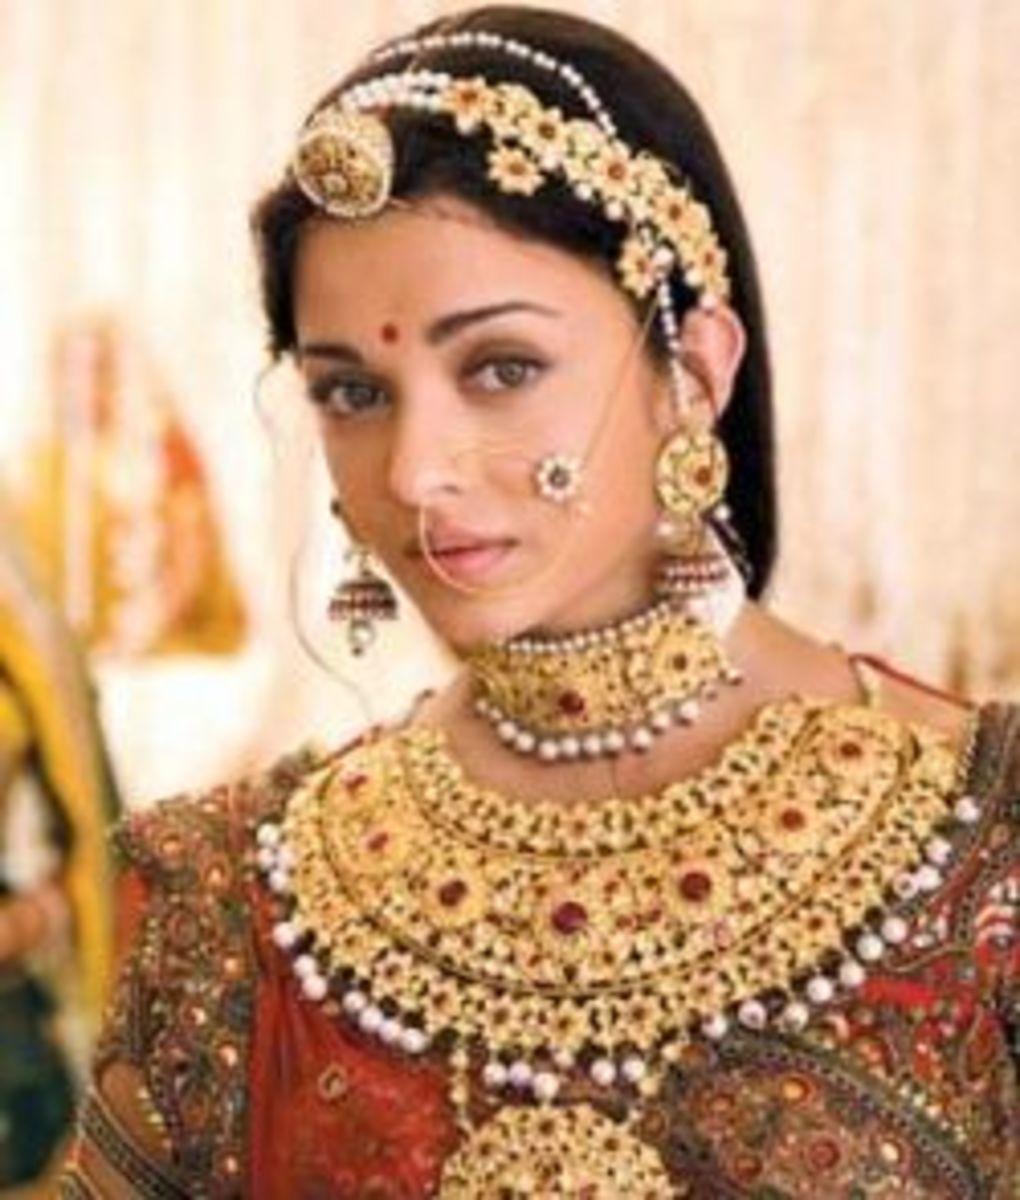 Aishwariya Rai as Jodhaa from Jodhaa-Akbar